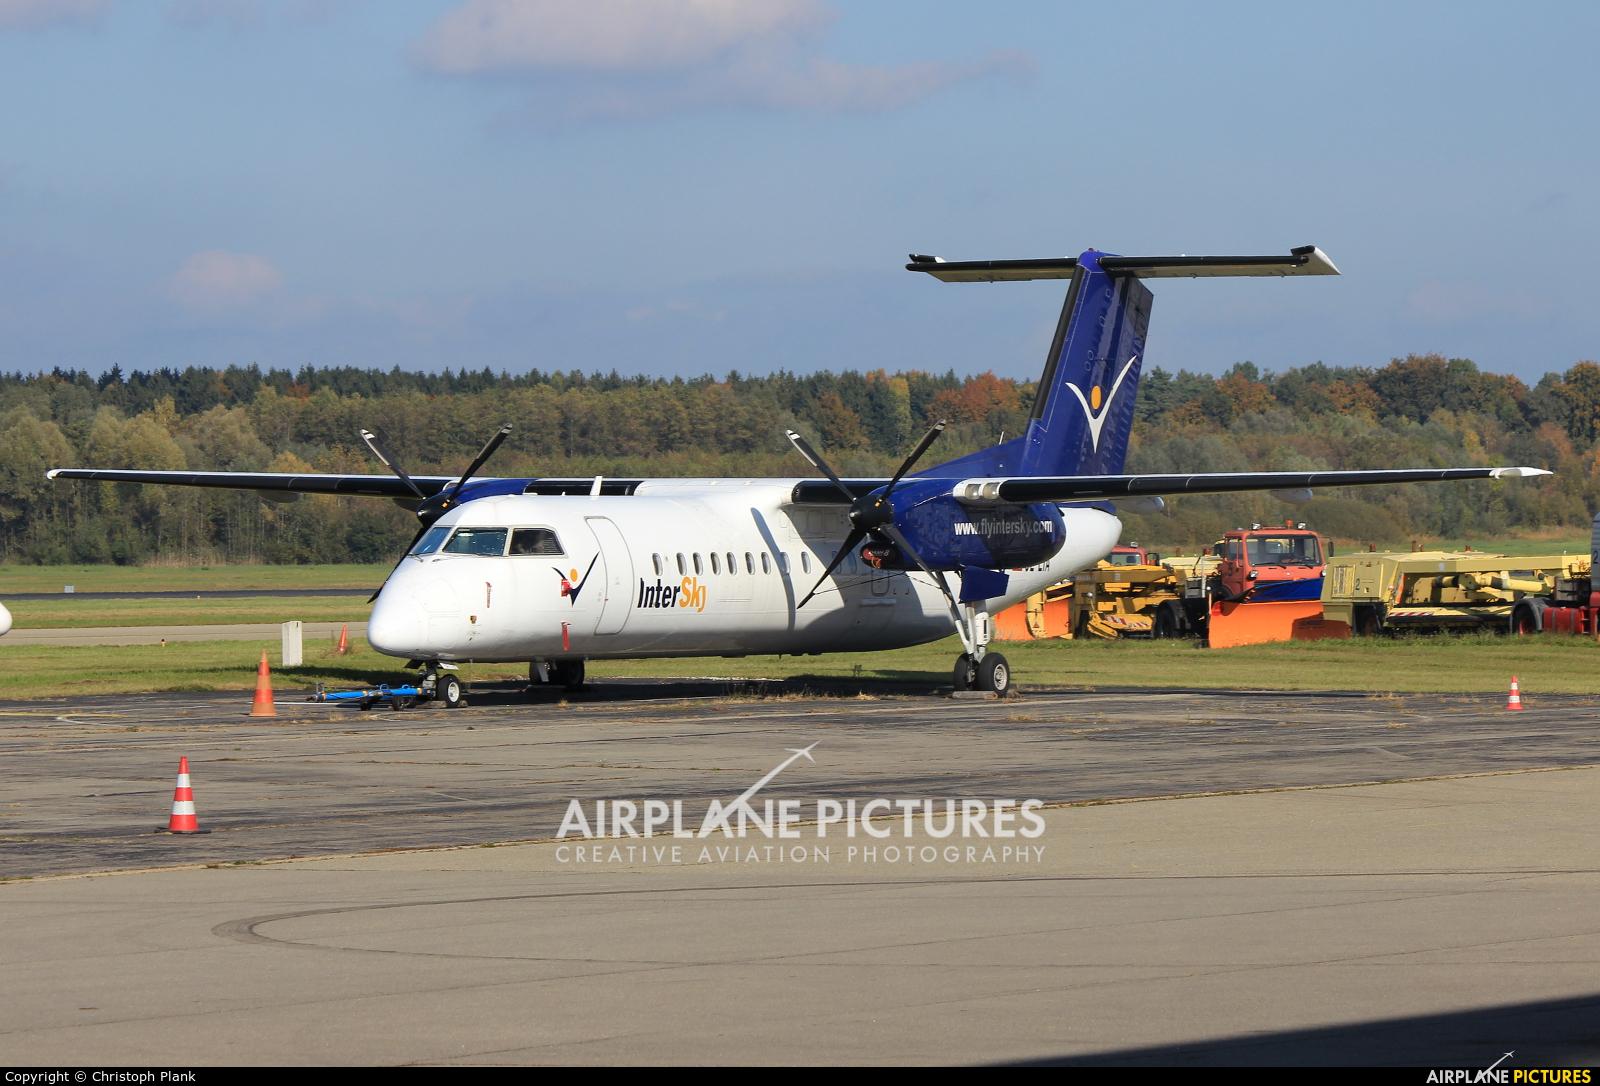 Intersky OE-LIA aircraft at Friedrichshafen